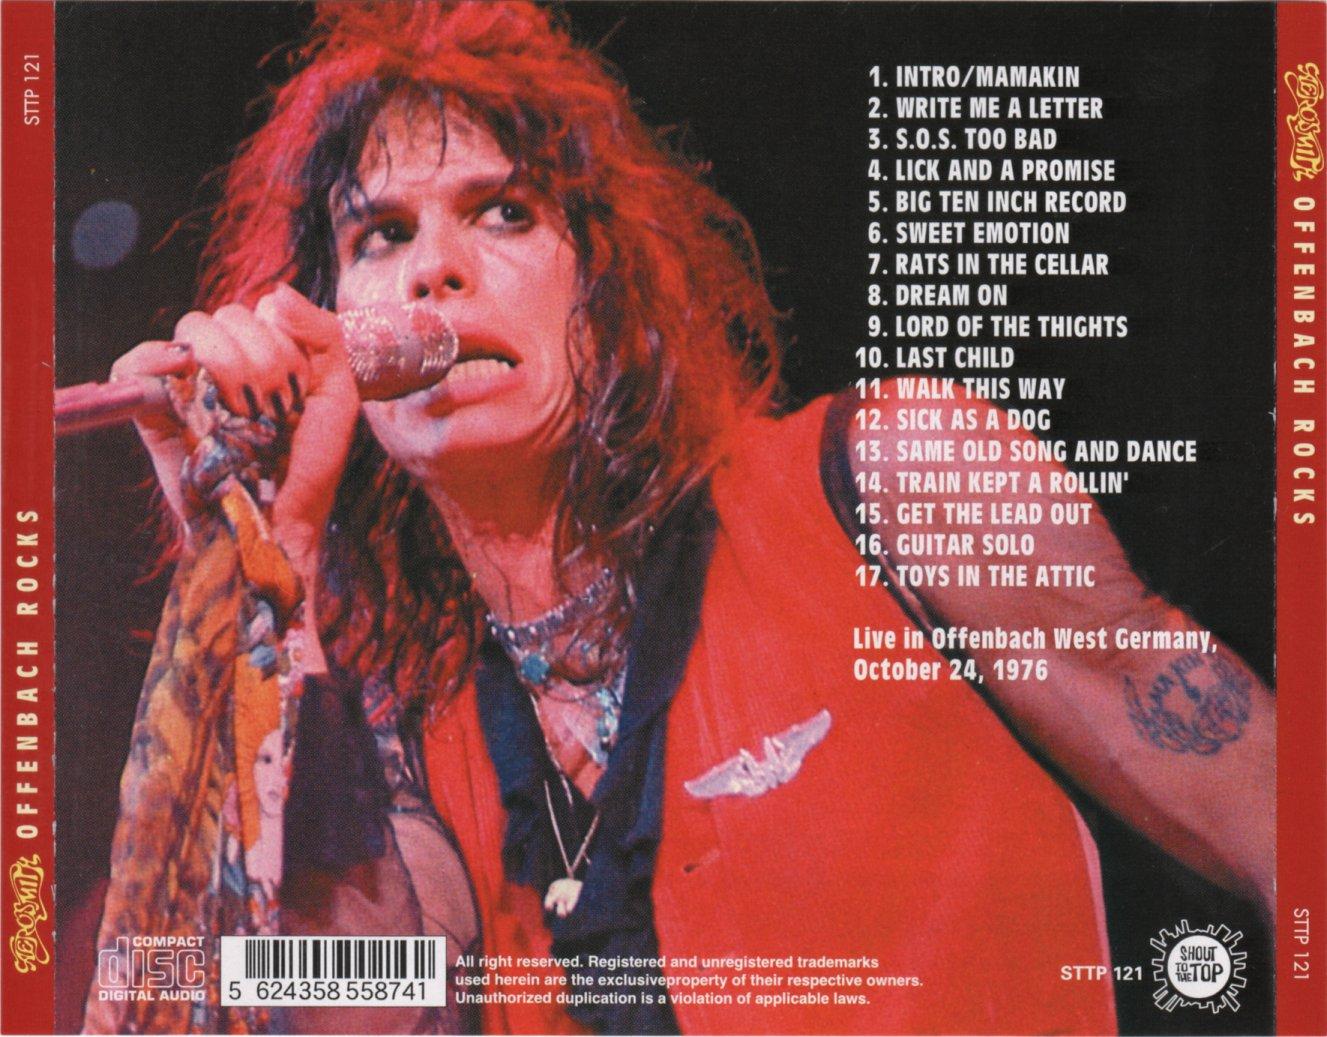 Reliquary Aerosmith 1976 10 26 Offenbach Rocks Sttp